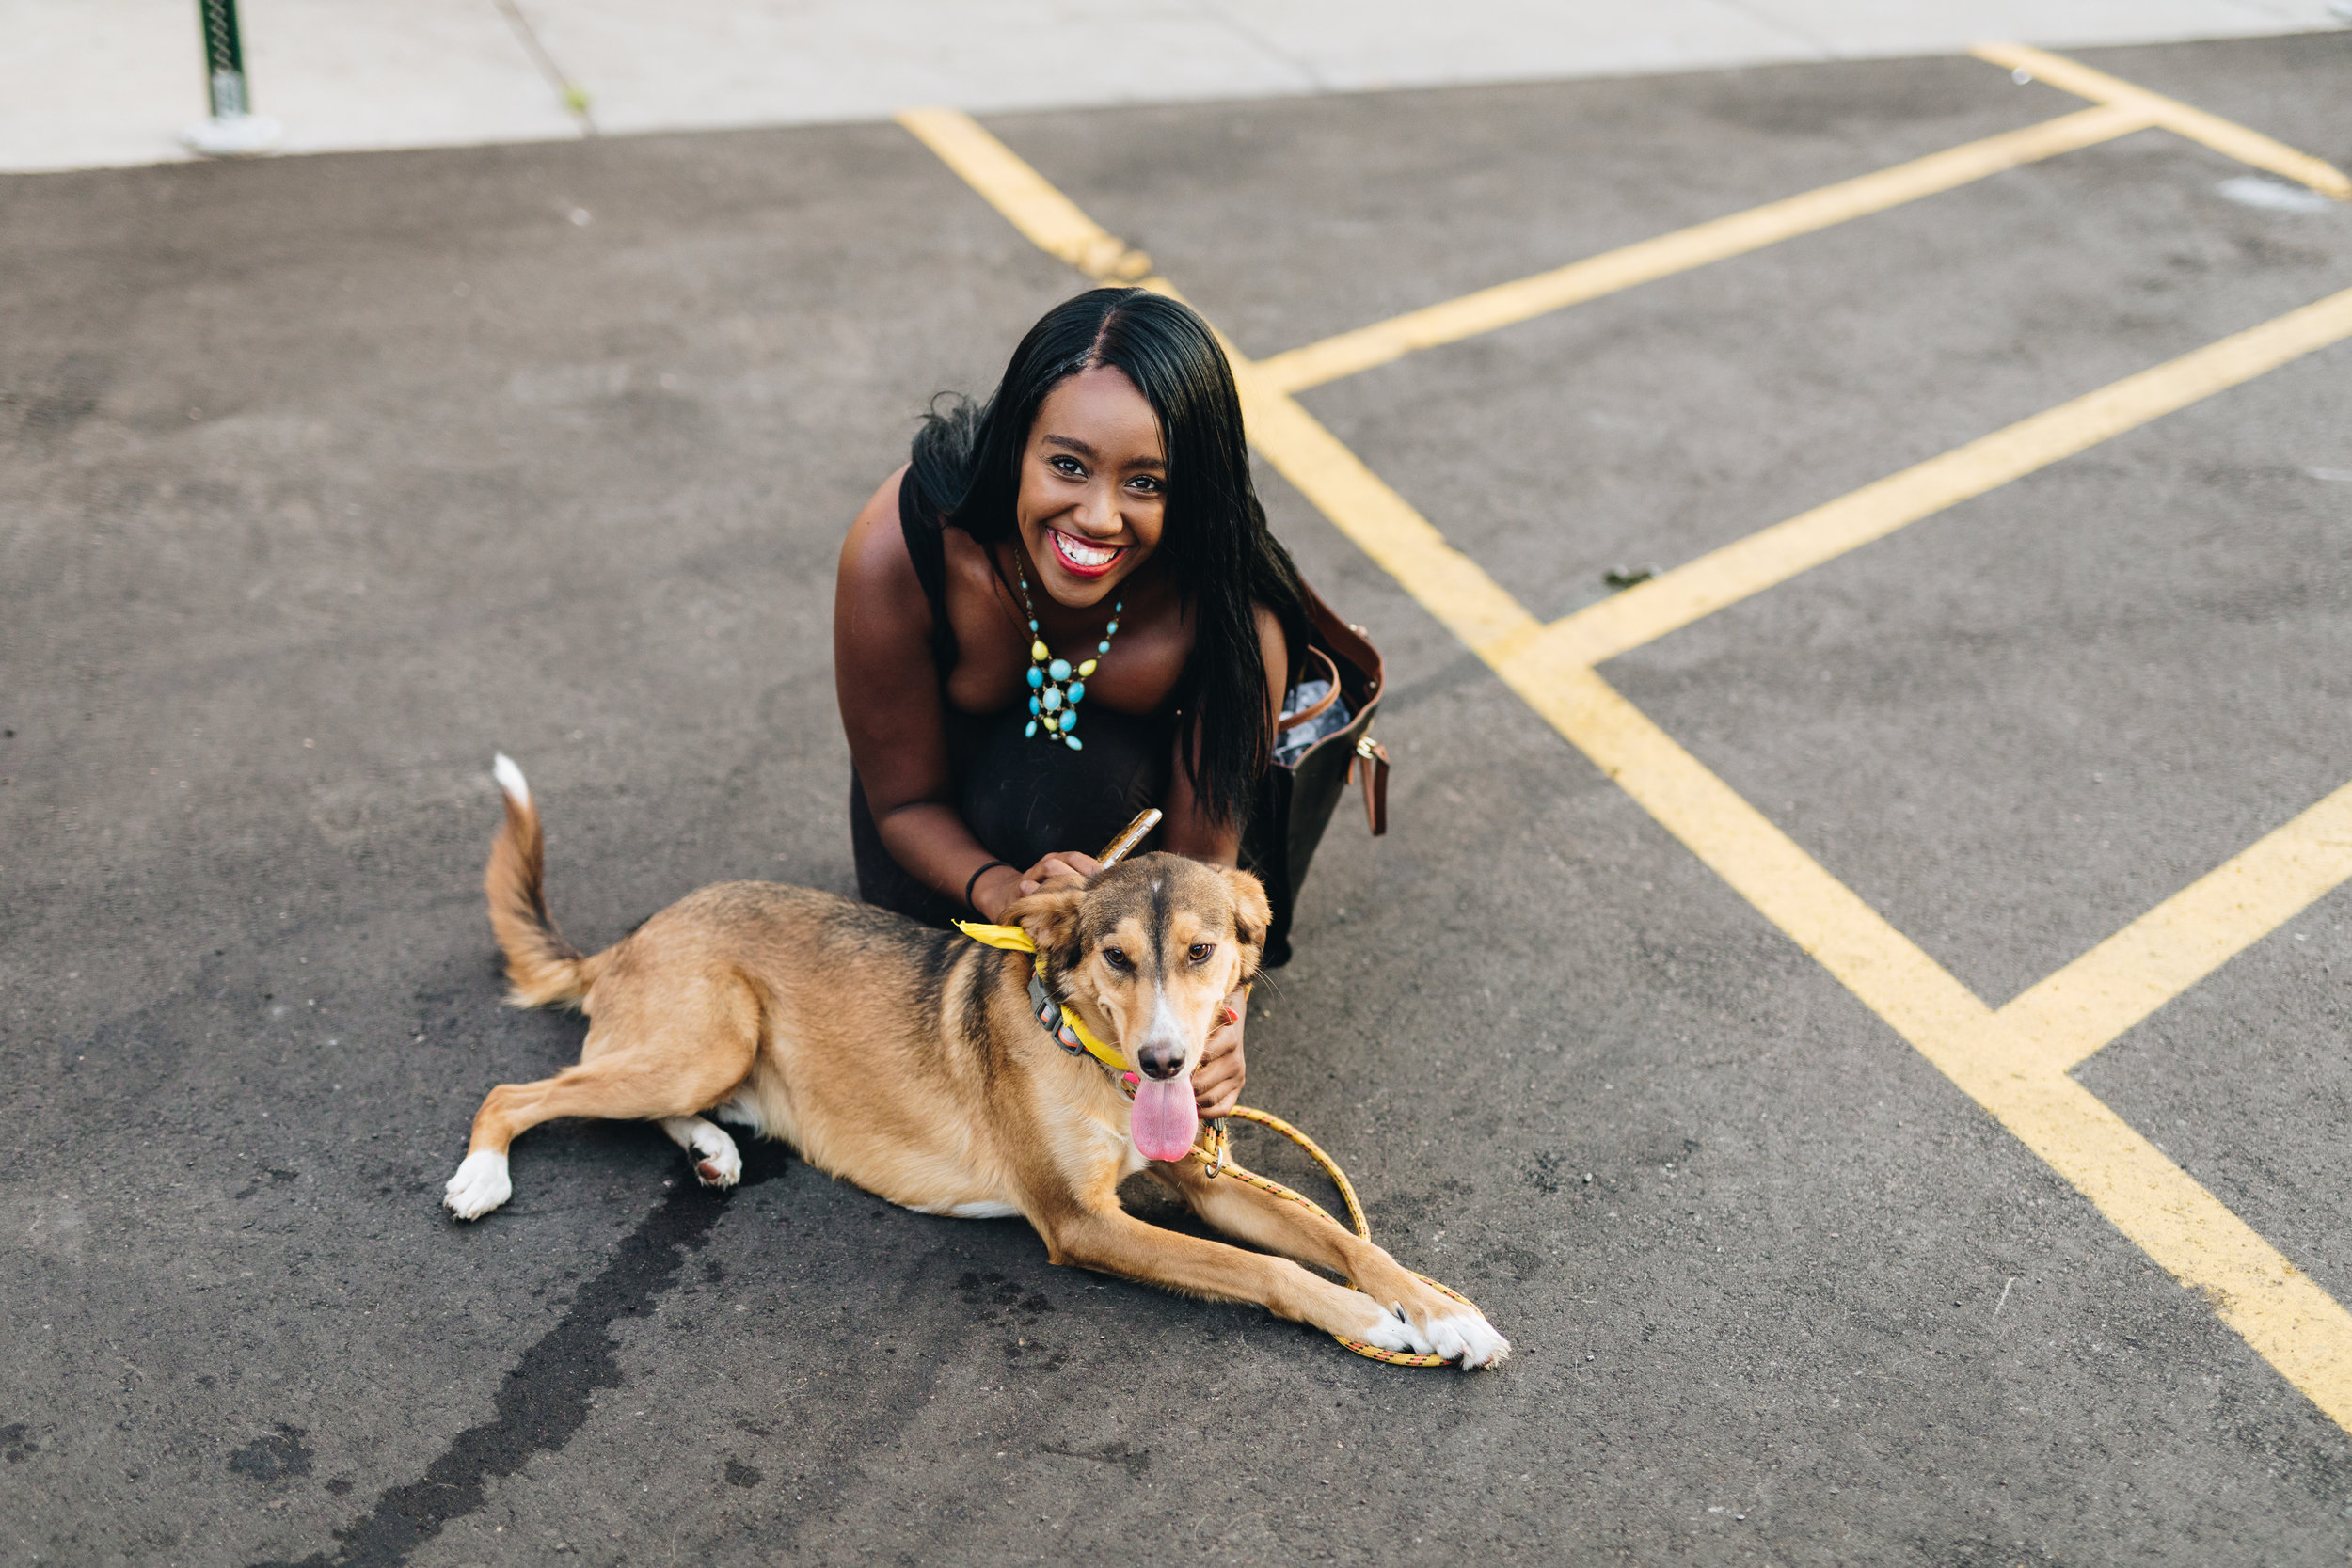 bumble-date-my-dog-x-nylonsaddle-2018-109.jpg